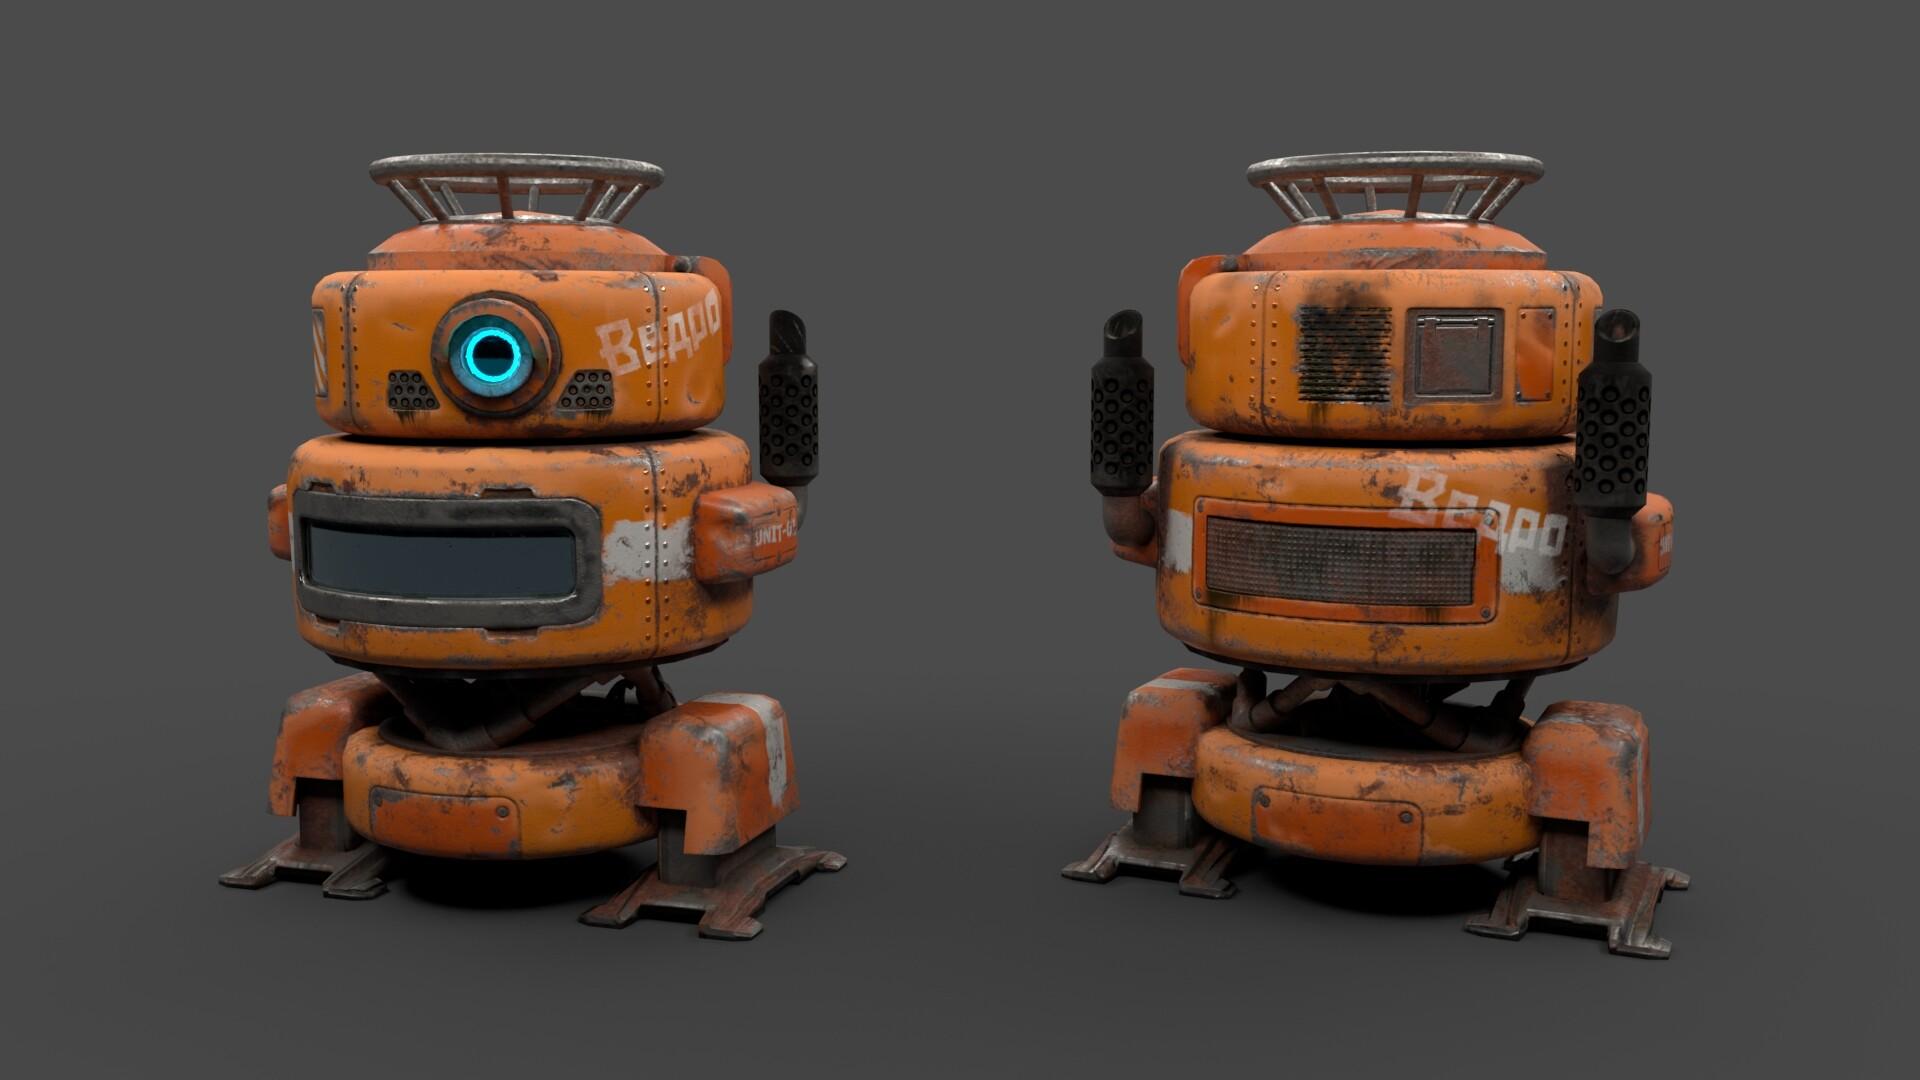 Iain gillespie quarrybot 02